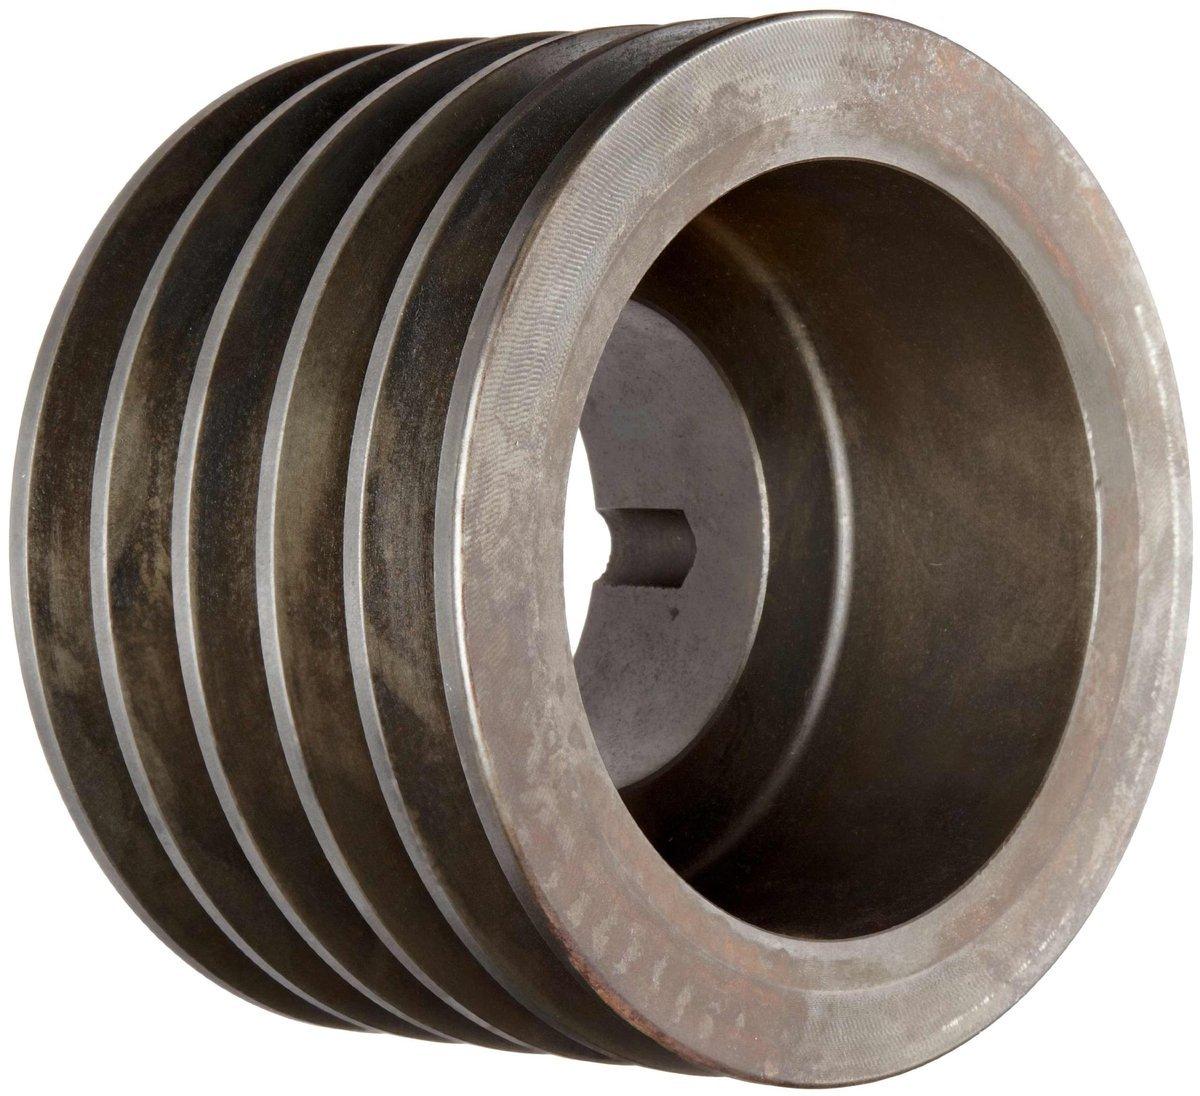 TL SPB335X5.3535 Ametric Metric 335 mm Outside Diameter, 5 Groove SPB/17 Dynamically Balanced Cast Iron V-Belt Pulley/Sheave,for 3535 Taper Lock Bushing, (Mfg Code 1-013)